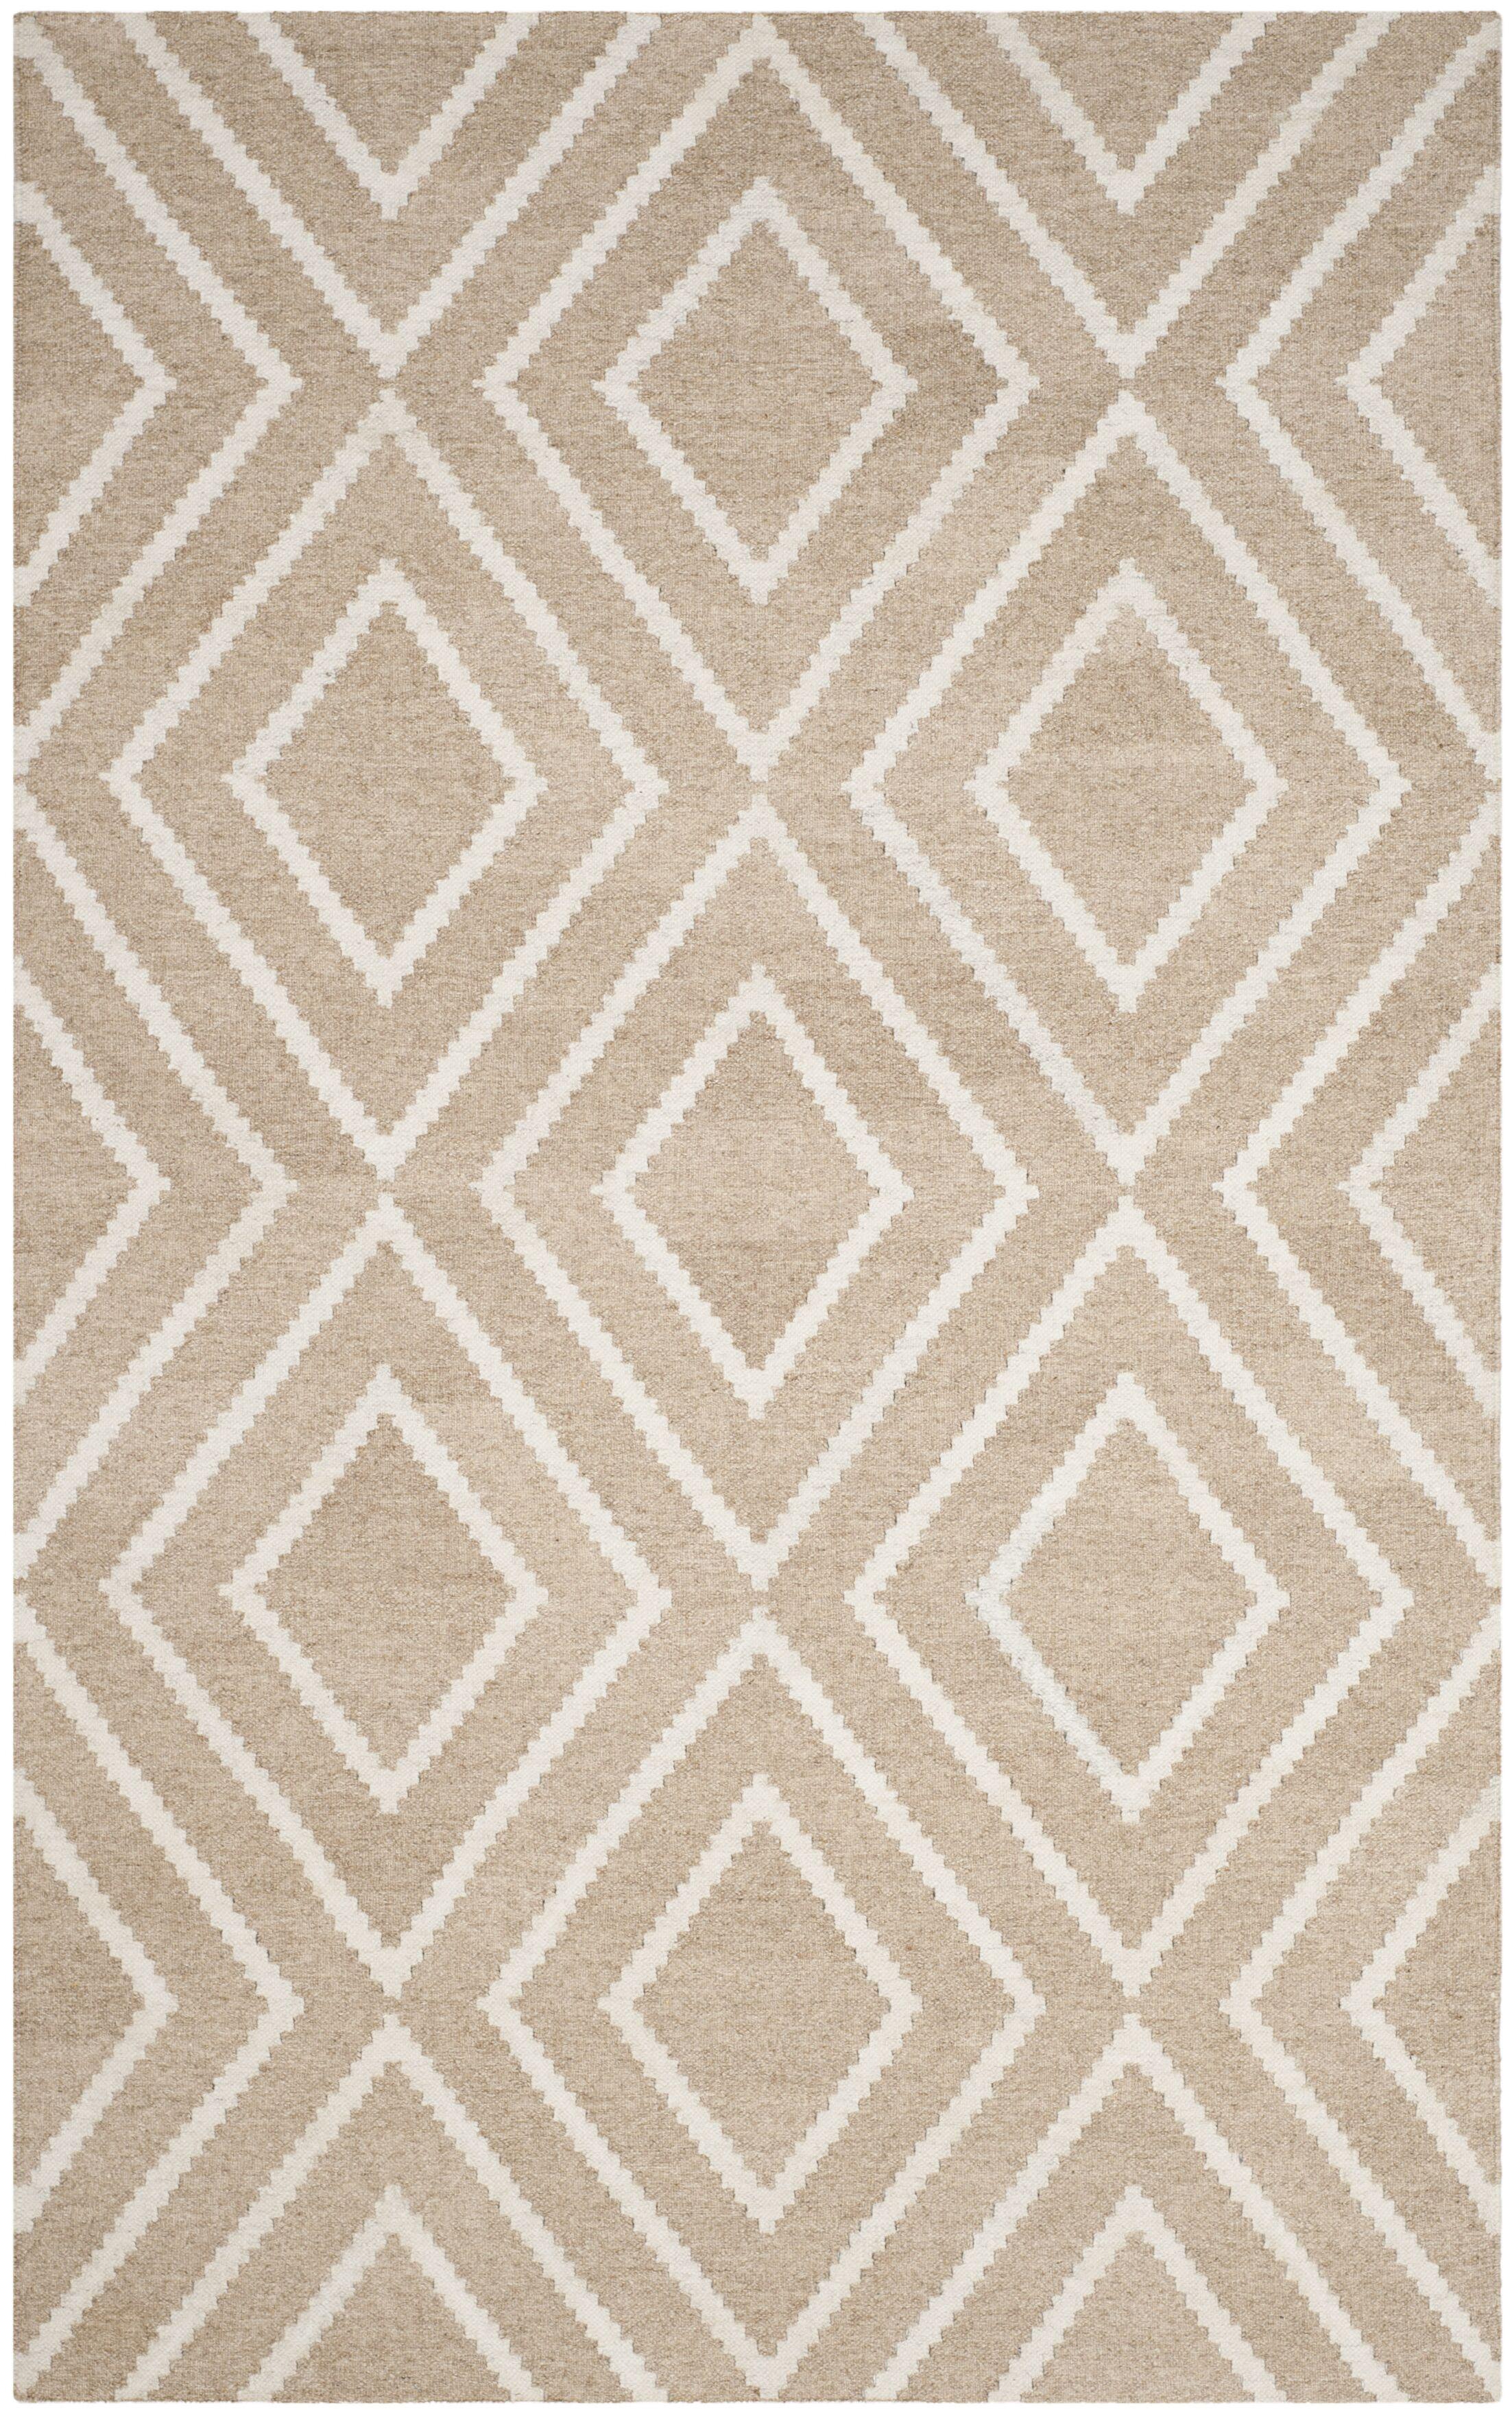 Mata Kilim Ivory & Beige Area Rug Rug Size: Rectangle 5' x 8'